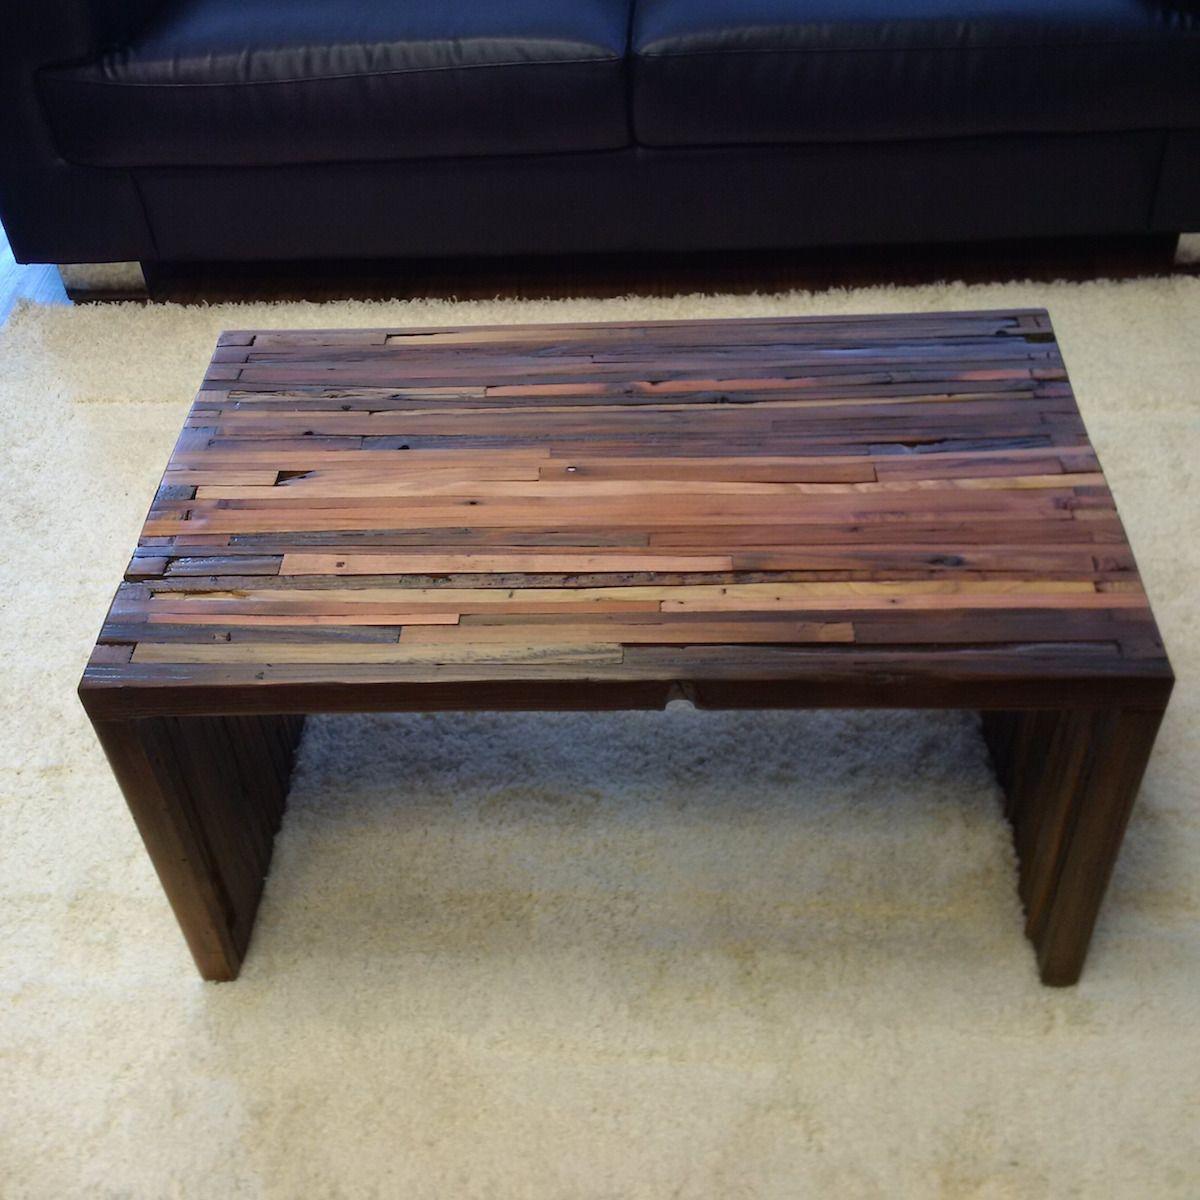 Make A Reclaimed Wood Coffee Table: Hand Made Reclaimed Wood Coffee Table By Sweet Redemption